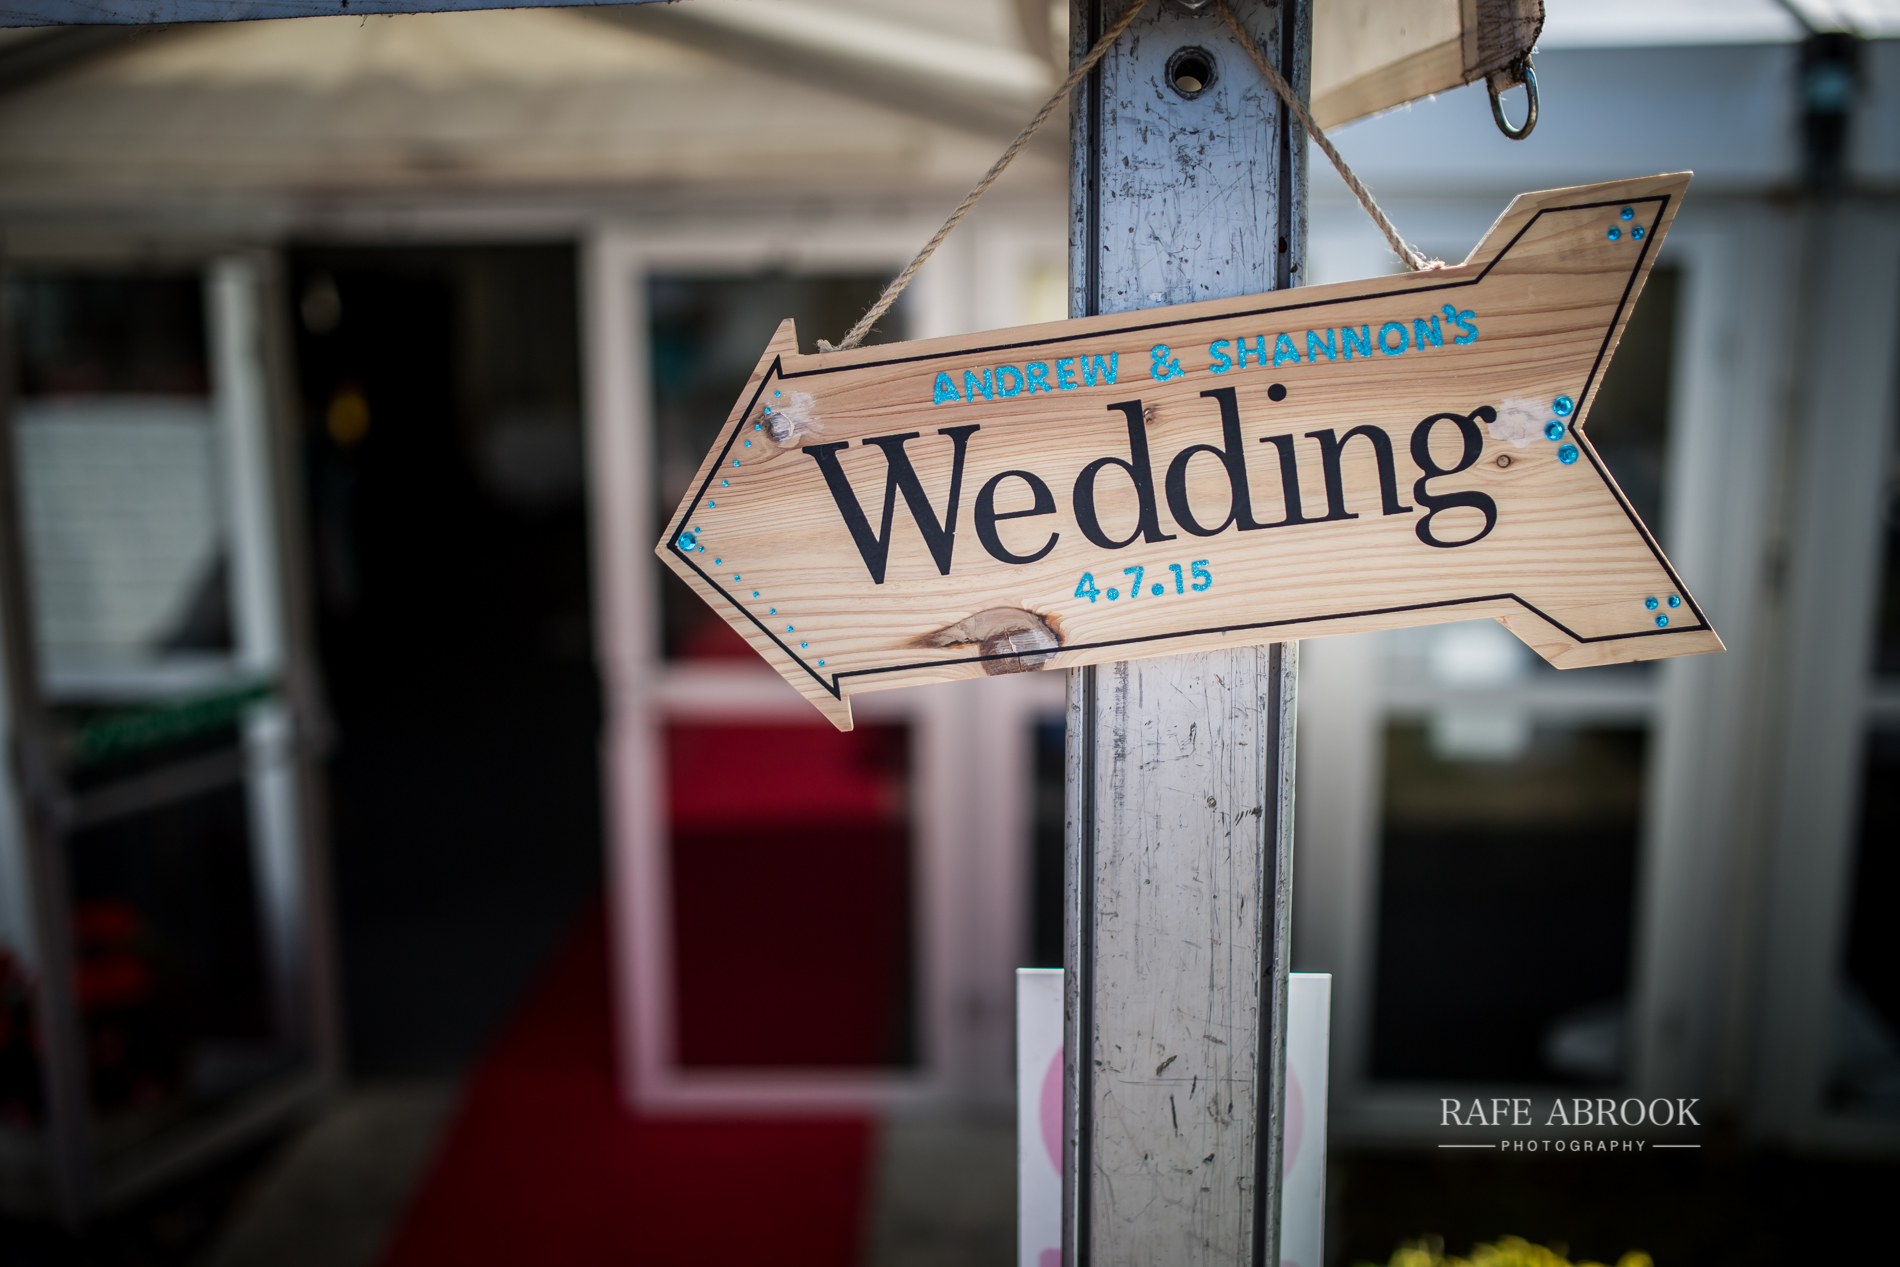 wedding photographer hertfordshire noke thistle hotel st albans -1294.jpg